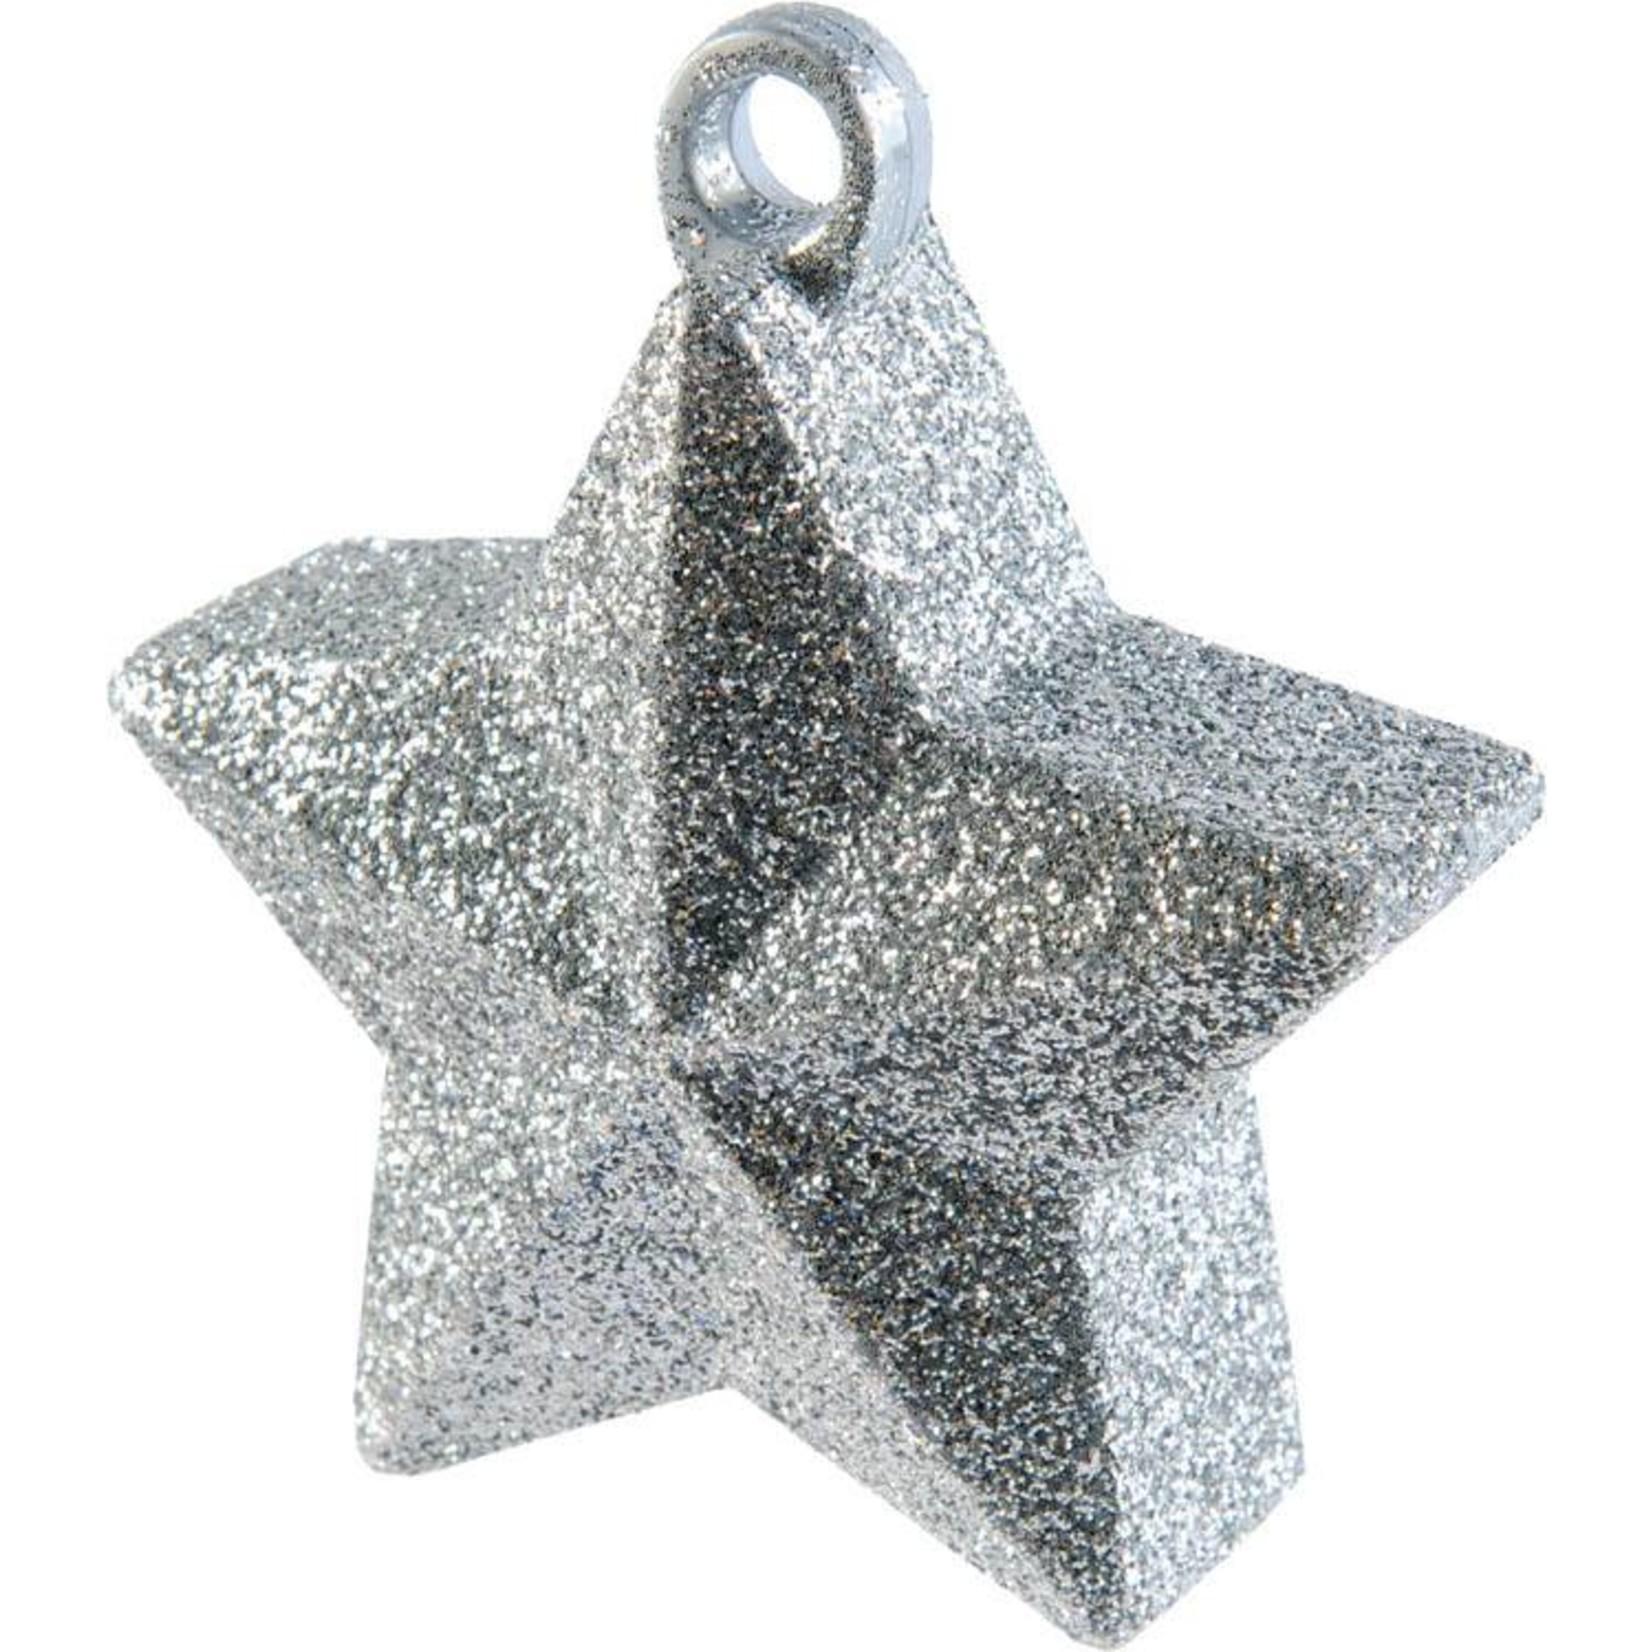 Balloon Weight-Glitter Star-Silver-6oz